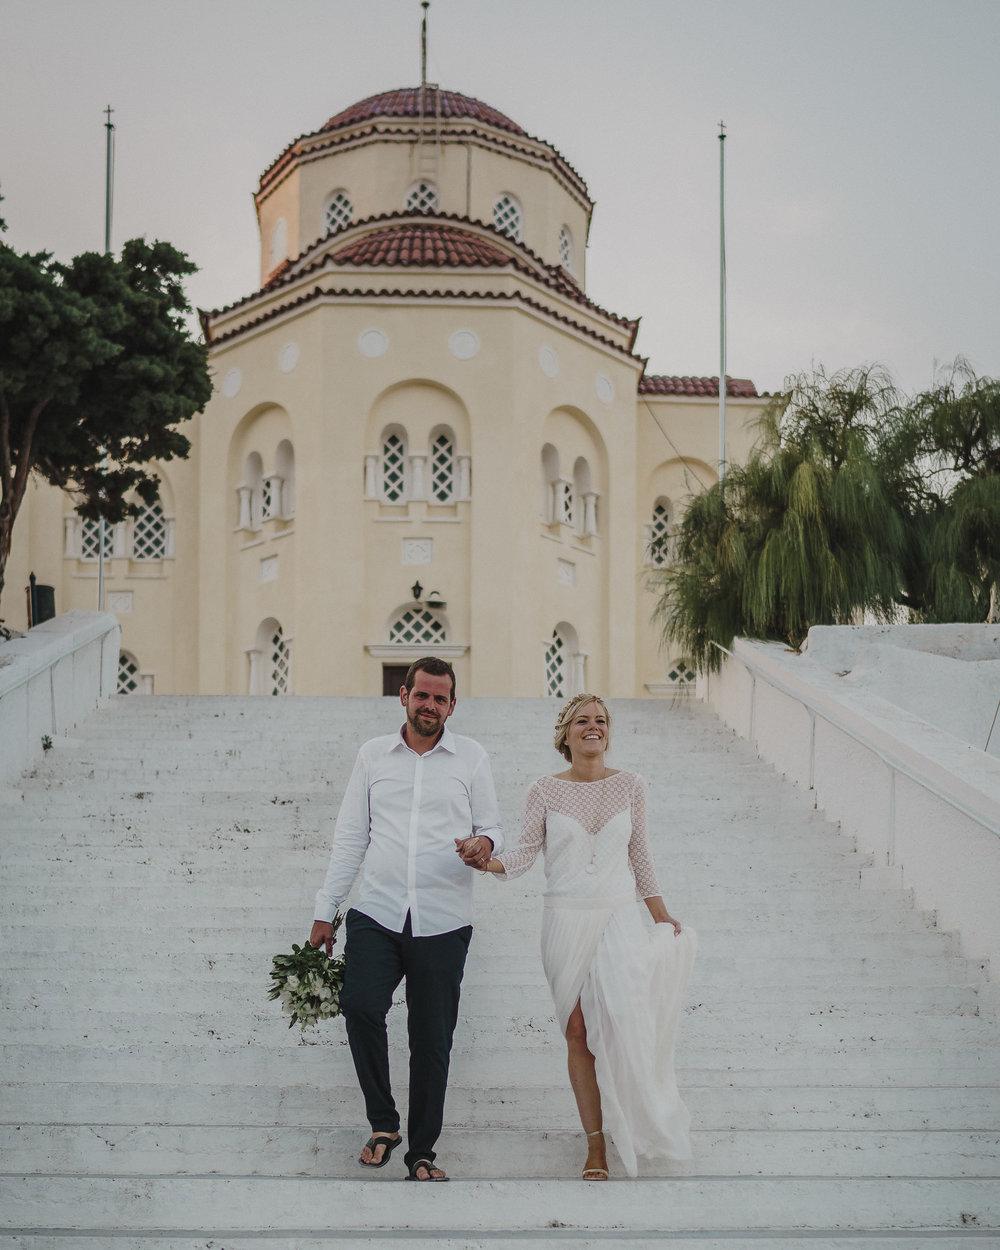 pyrgos-wedding-photographer-santorini-0173.jpg